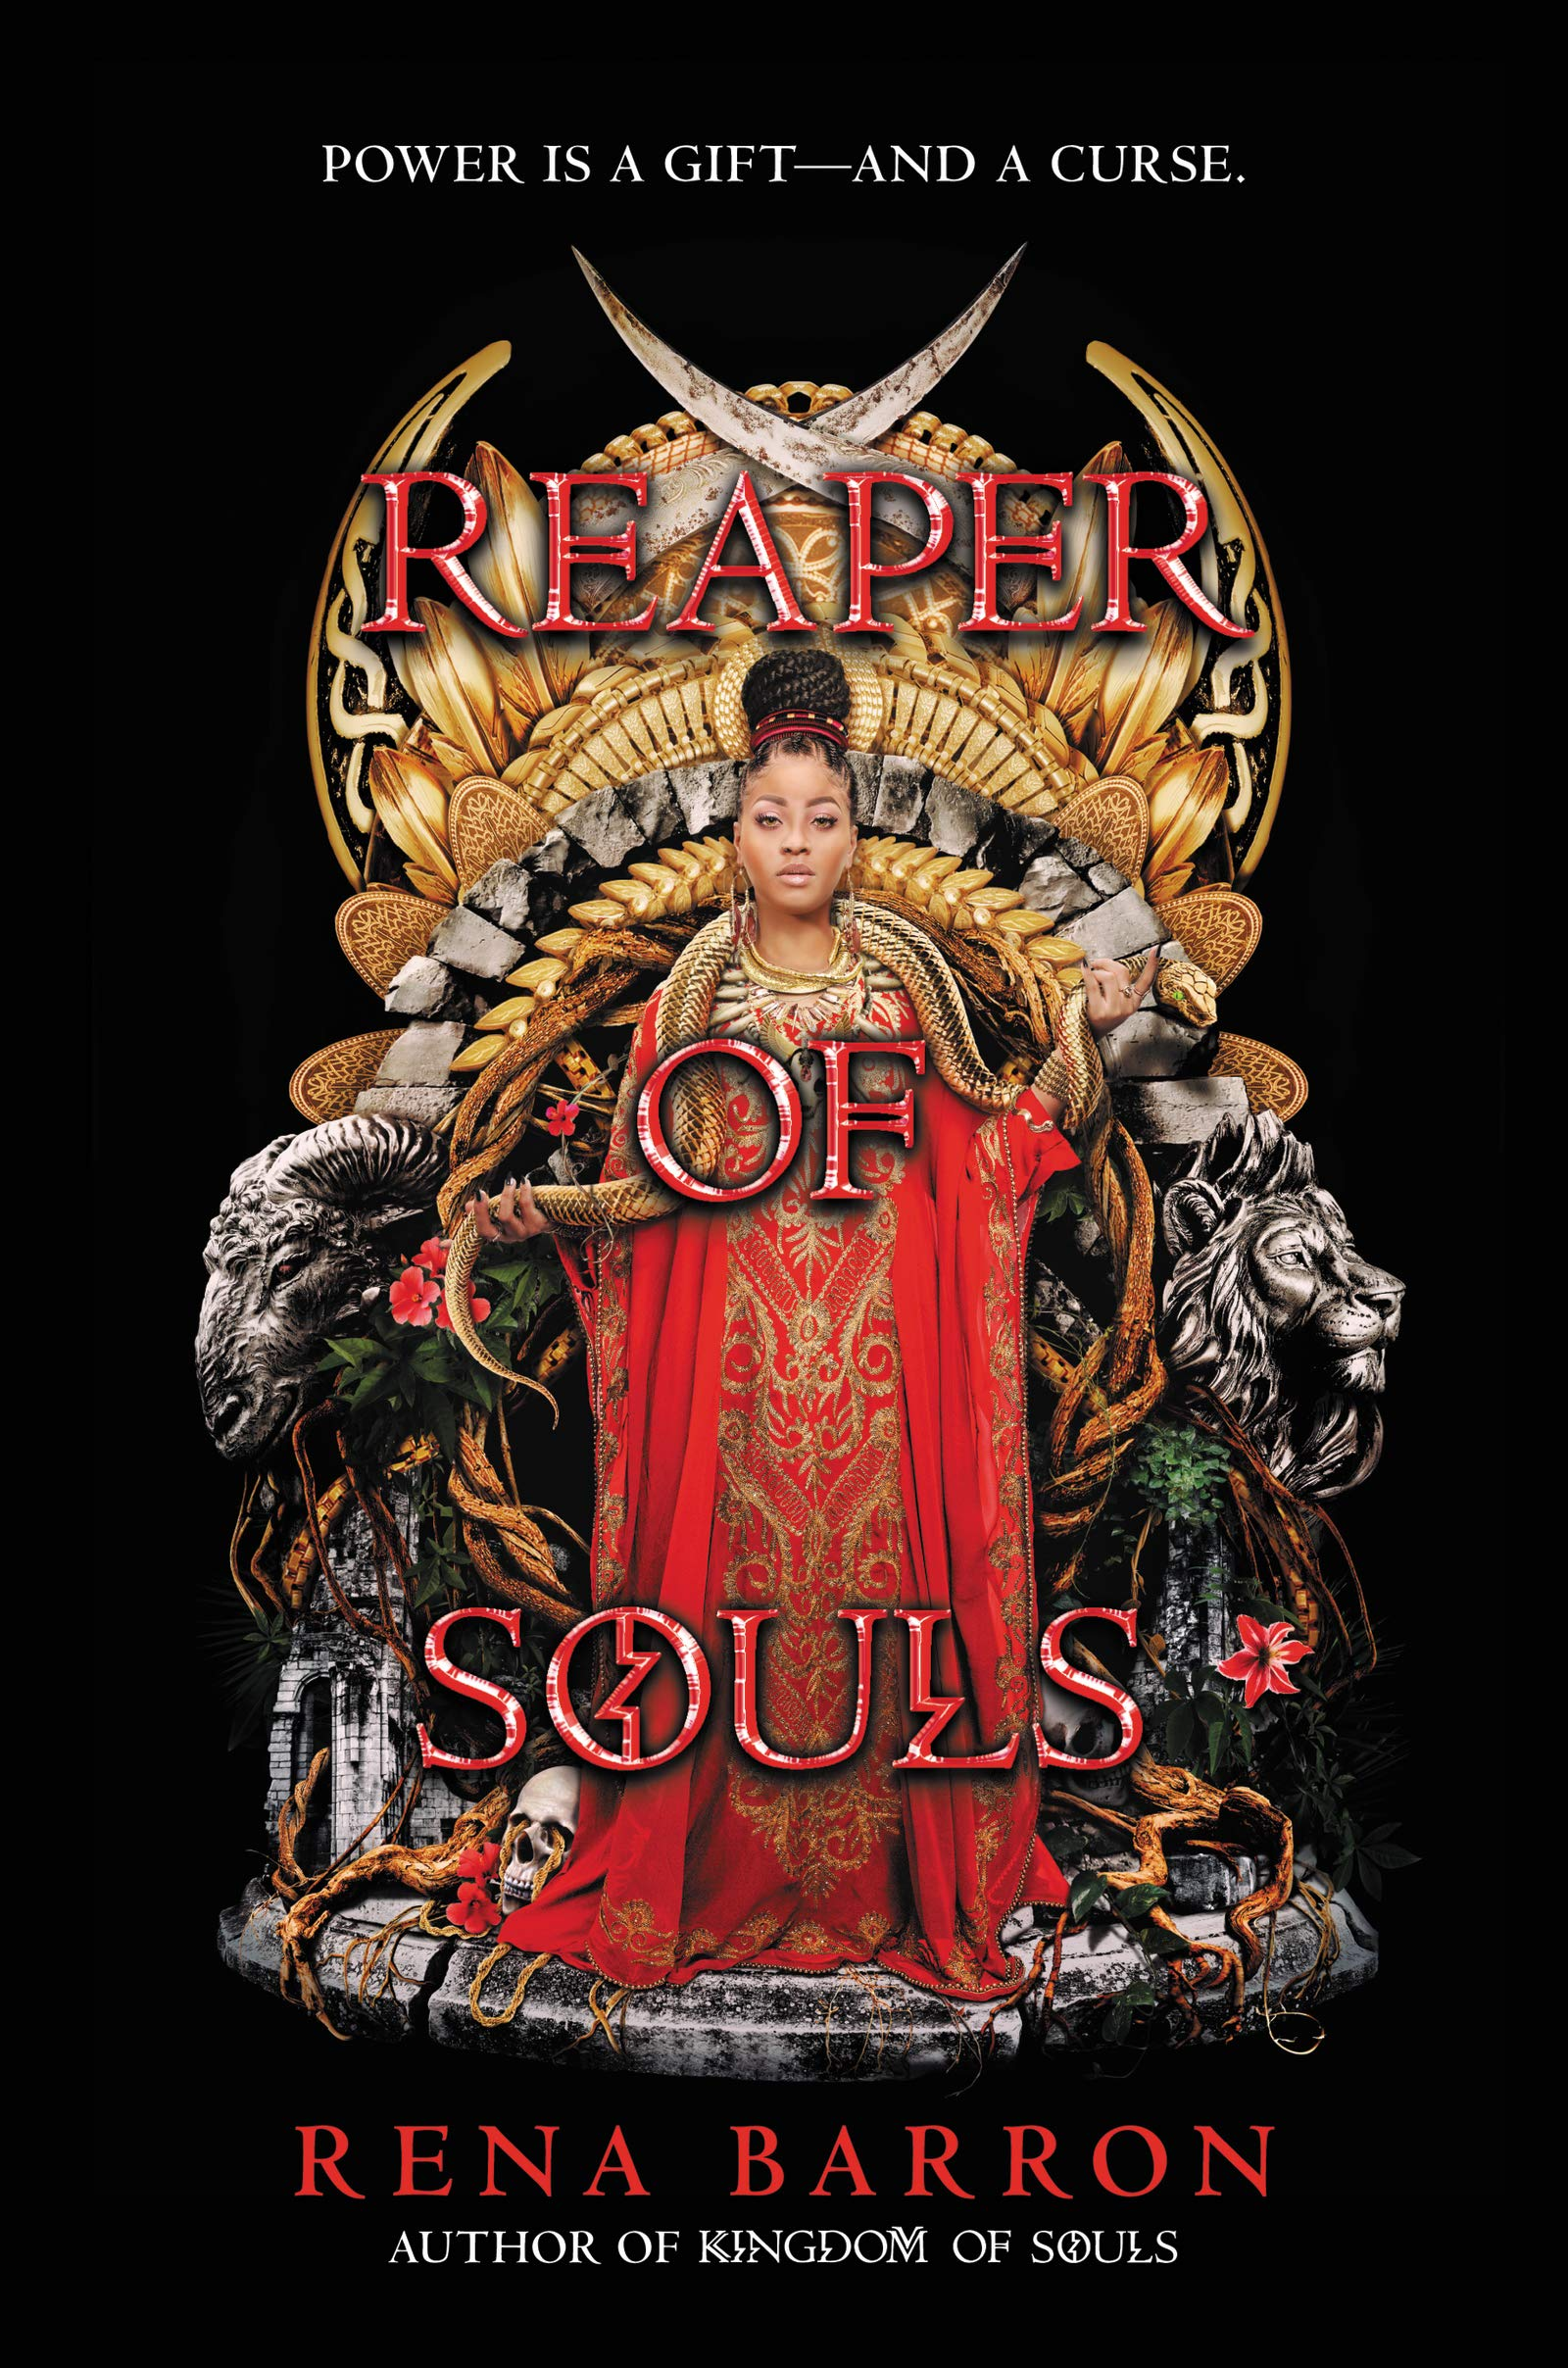 Amazon.com: Reaper of Souls (Kingdom of Souls) (9780062870988): Barron,  Rena: Books